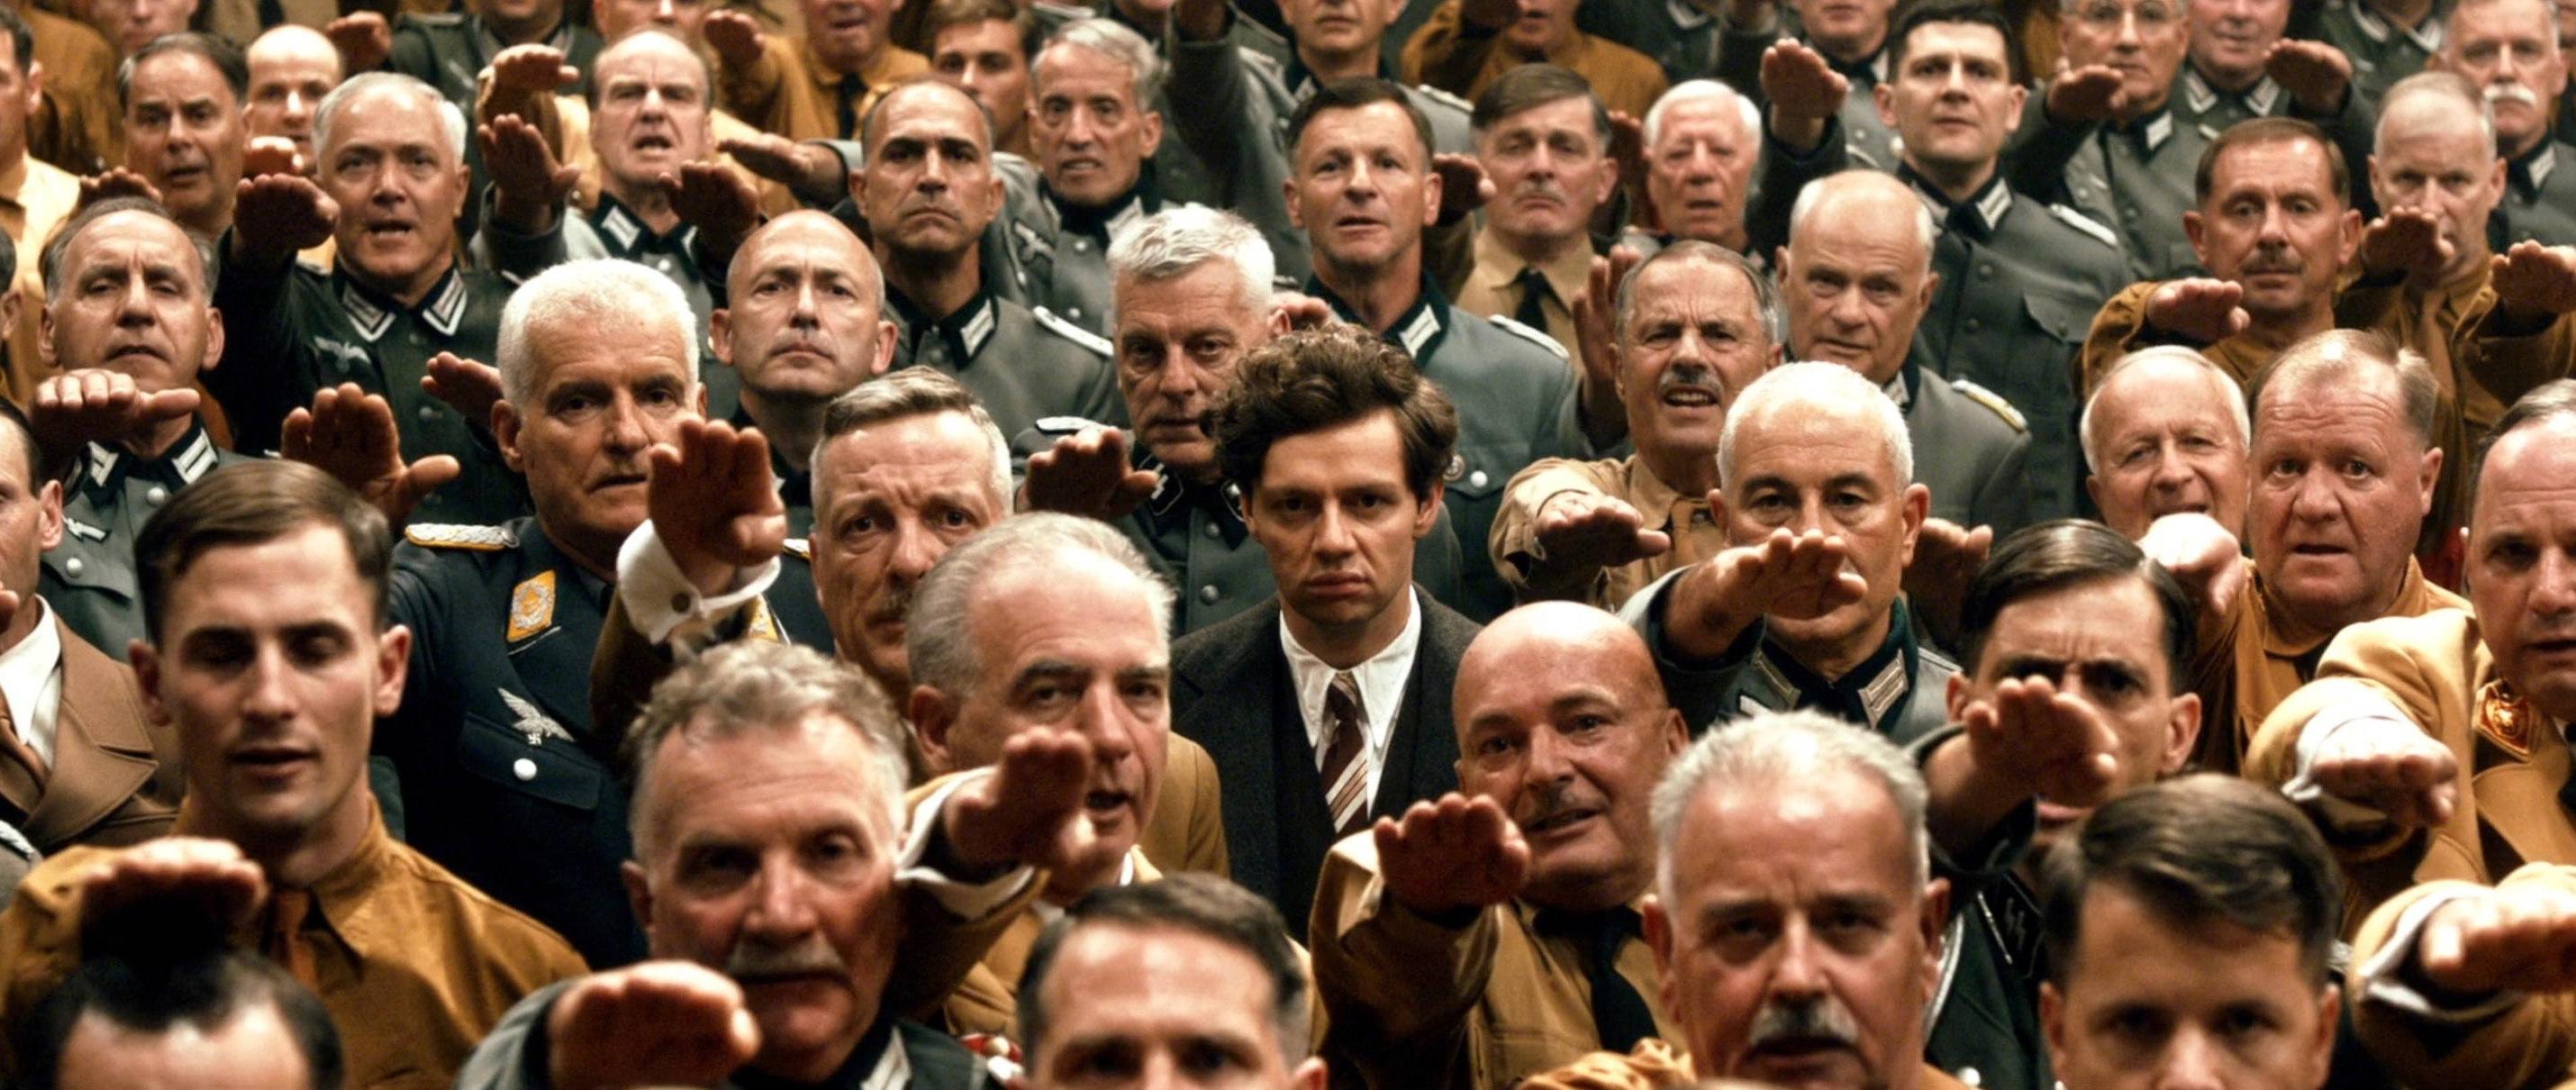 Elser - Elser verweigert den Hitlergruß- Regie Oliver Hirschbiegel - Kamera Judith Kaufmann